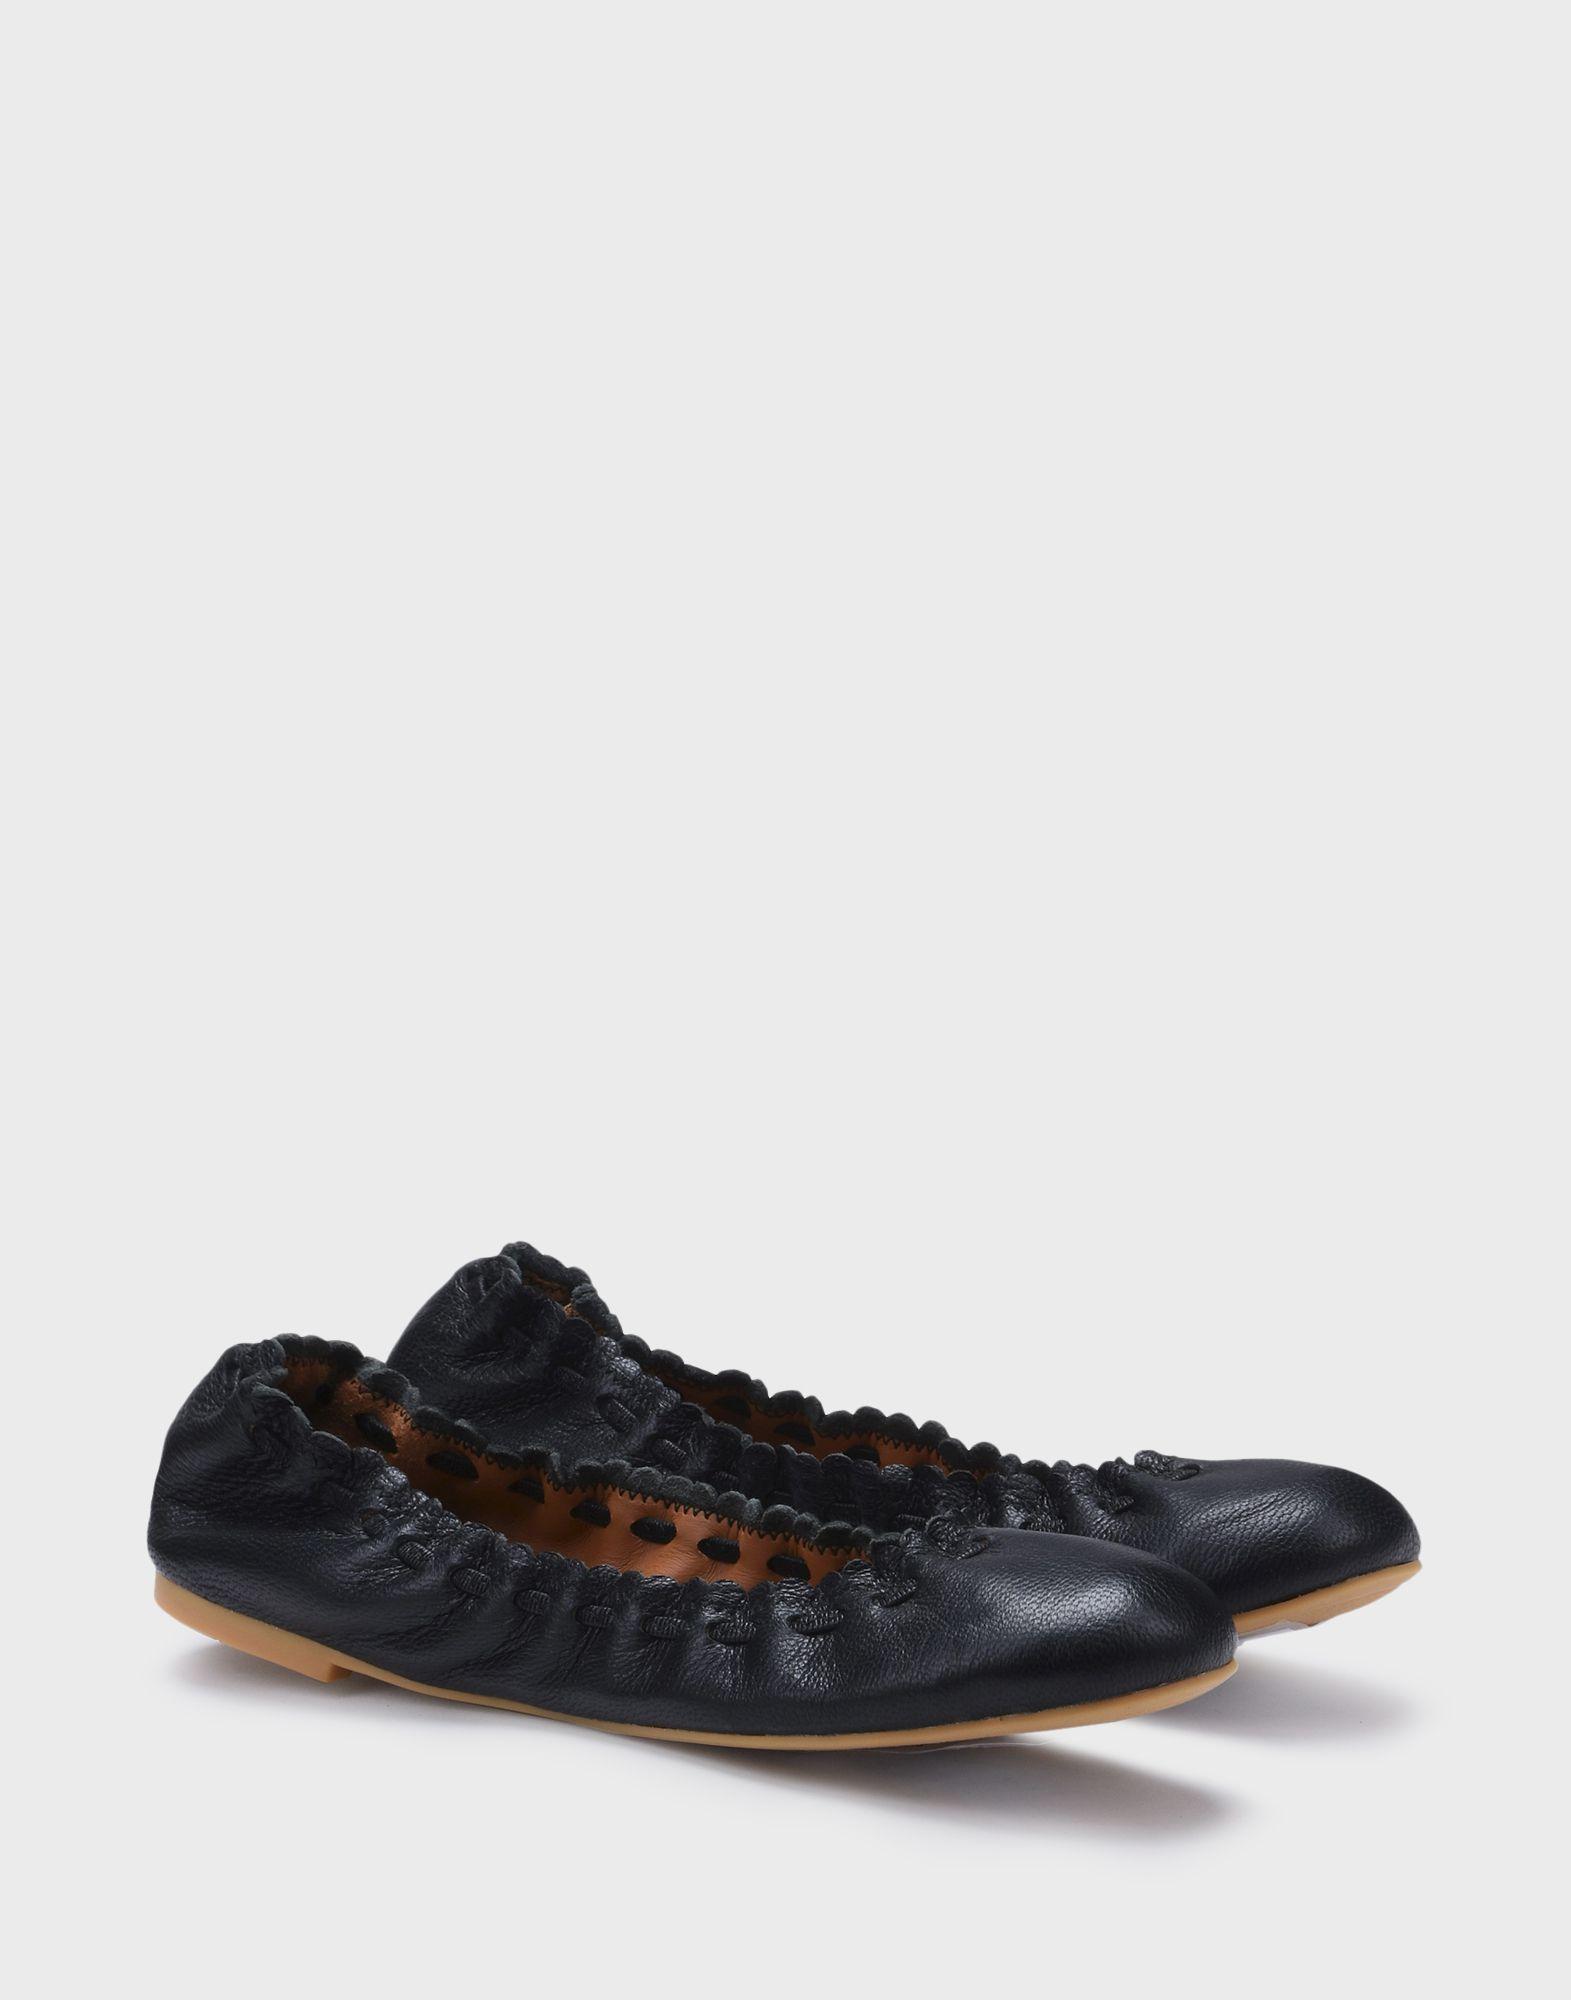 Rabatt Chloé Schuhe See By Chloé Rabatt Ballerinas Damen  11380346WN c0528e